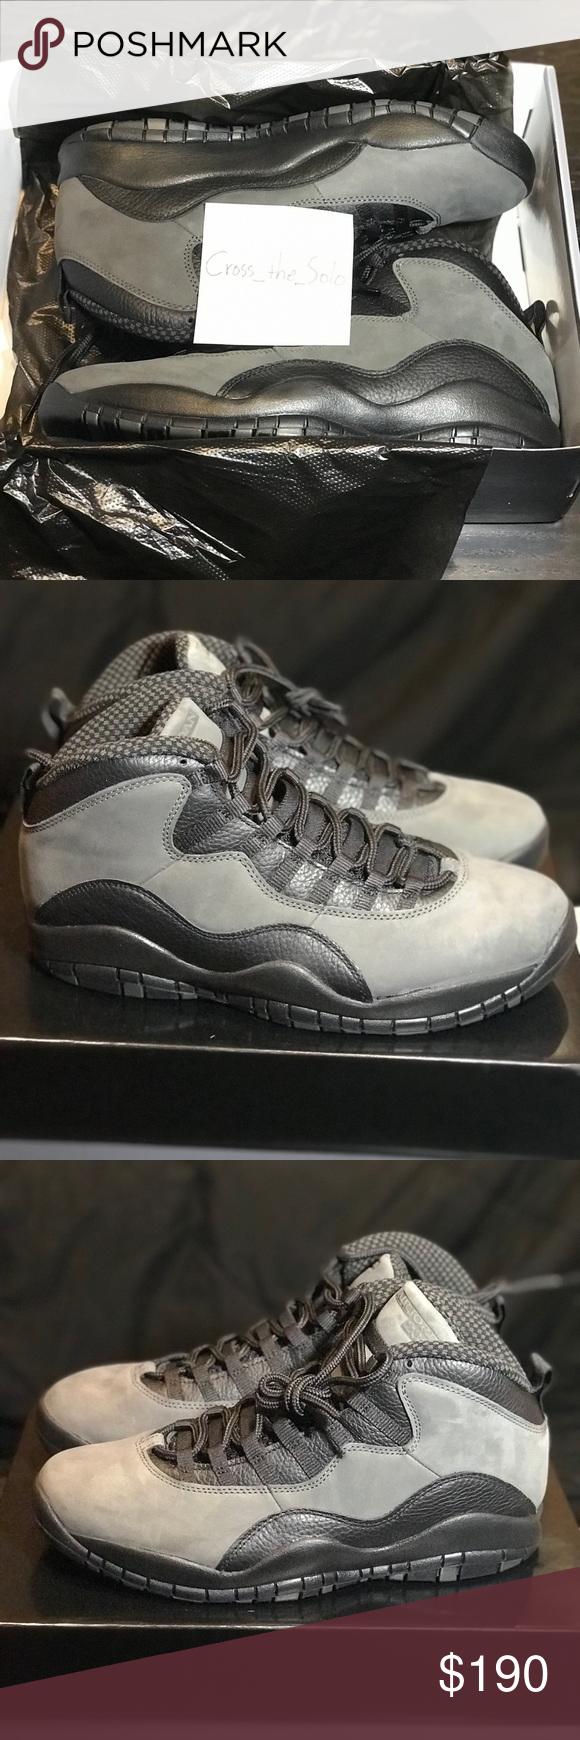 8914392a0b1 New - Air Jordan 10 Dark Shadow - Men's 11 New in box Air Jordan 10 Dark  Shadow/True Red-Black Men's 11 Great basketball shoe or fashion sneaker  Jordan ...